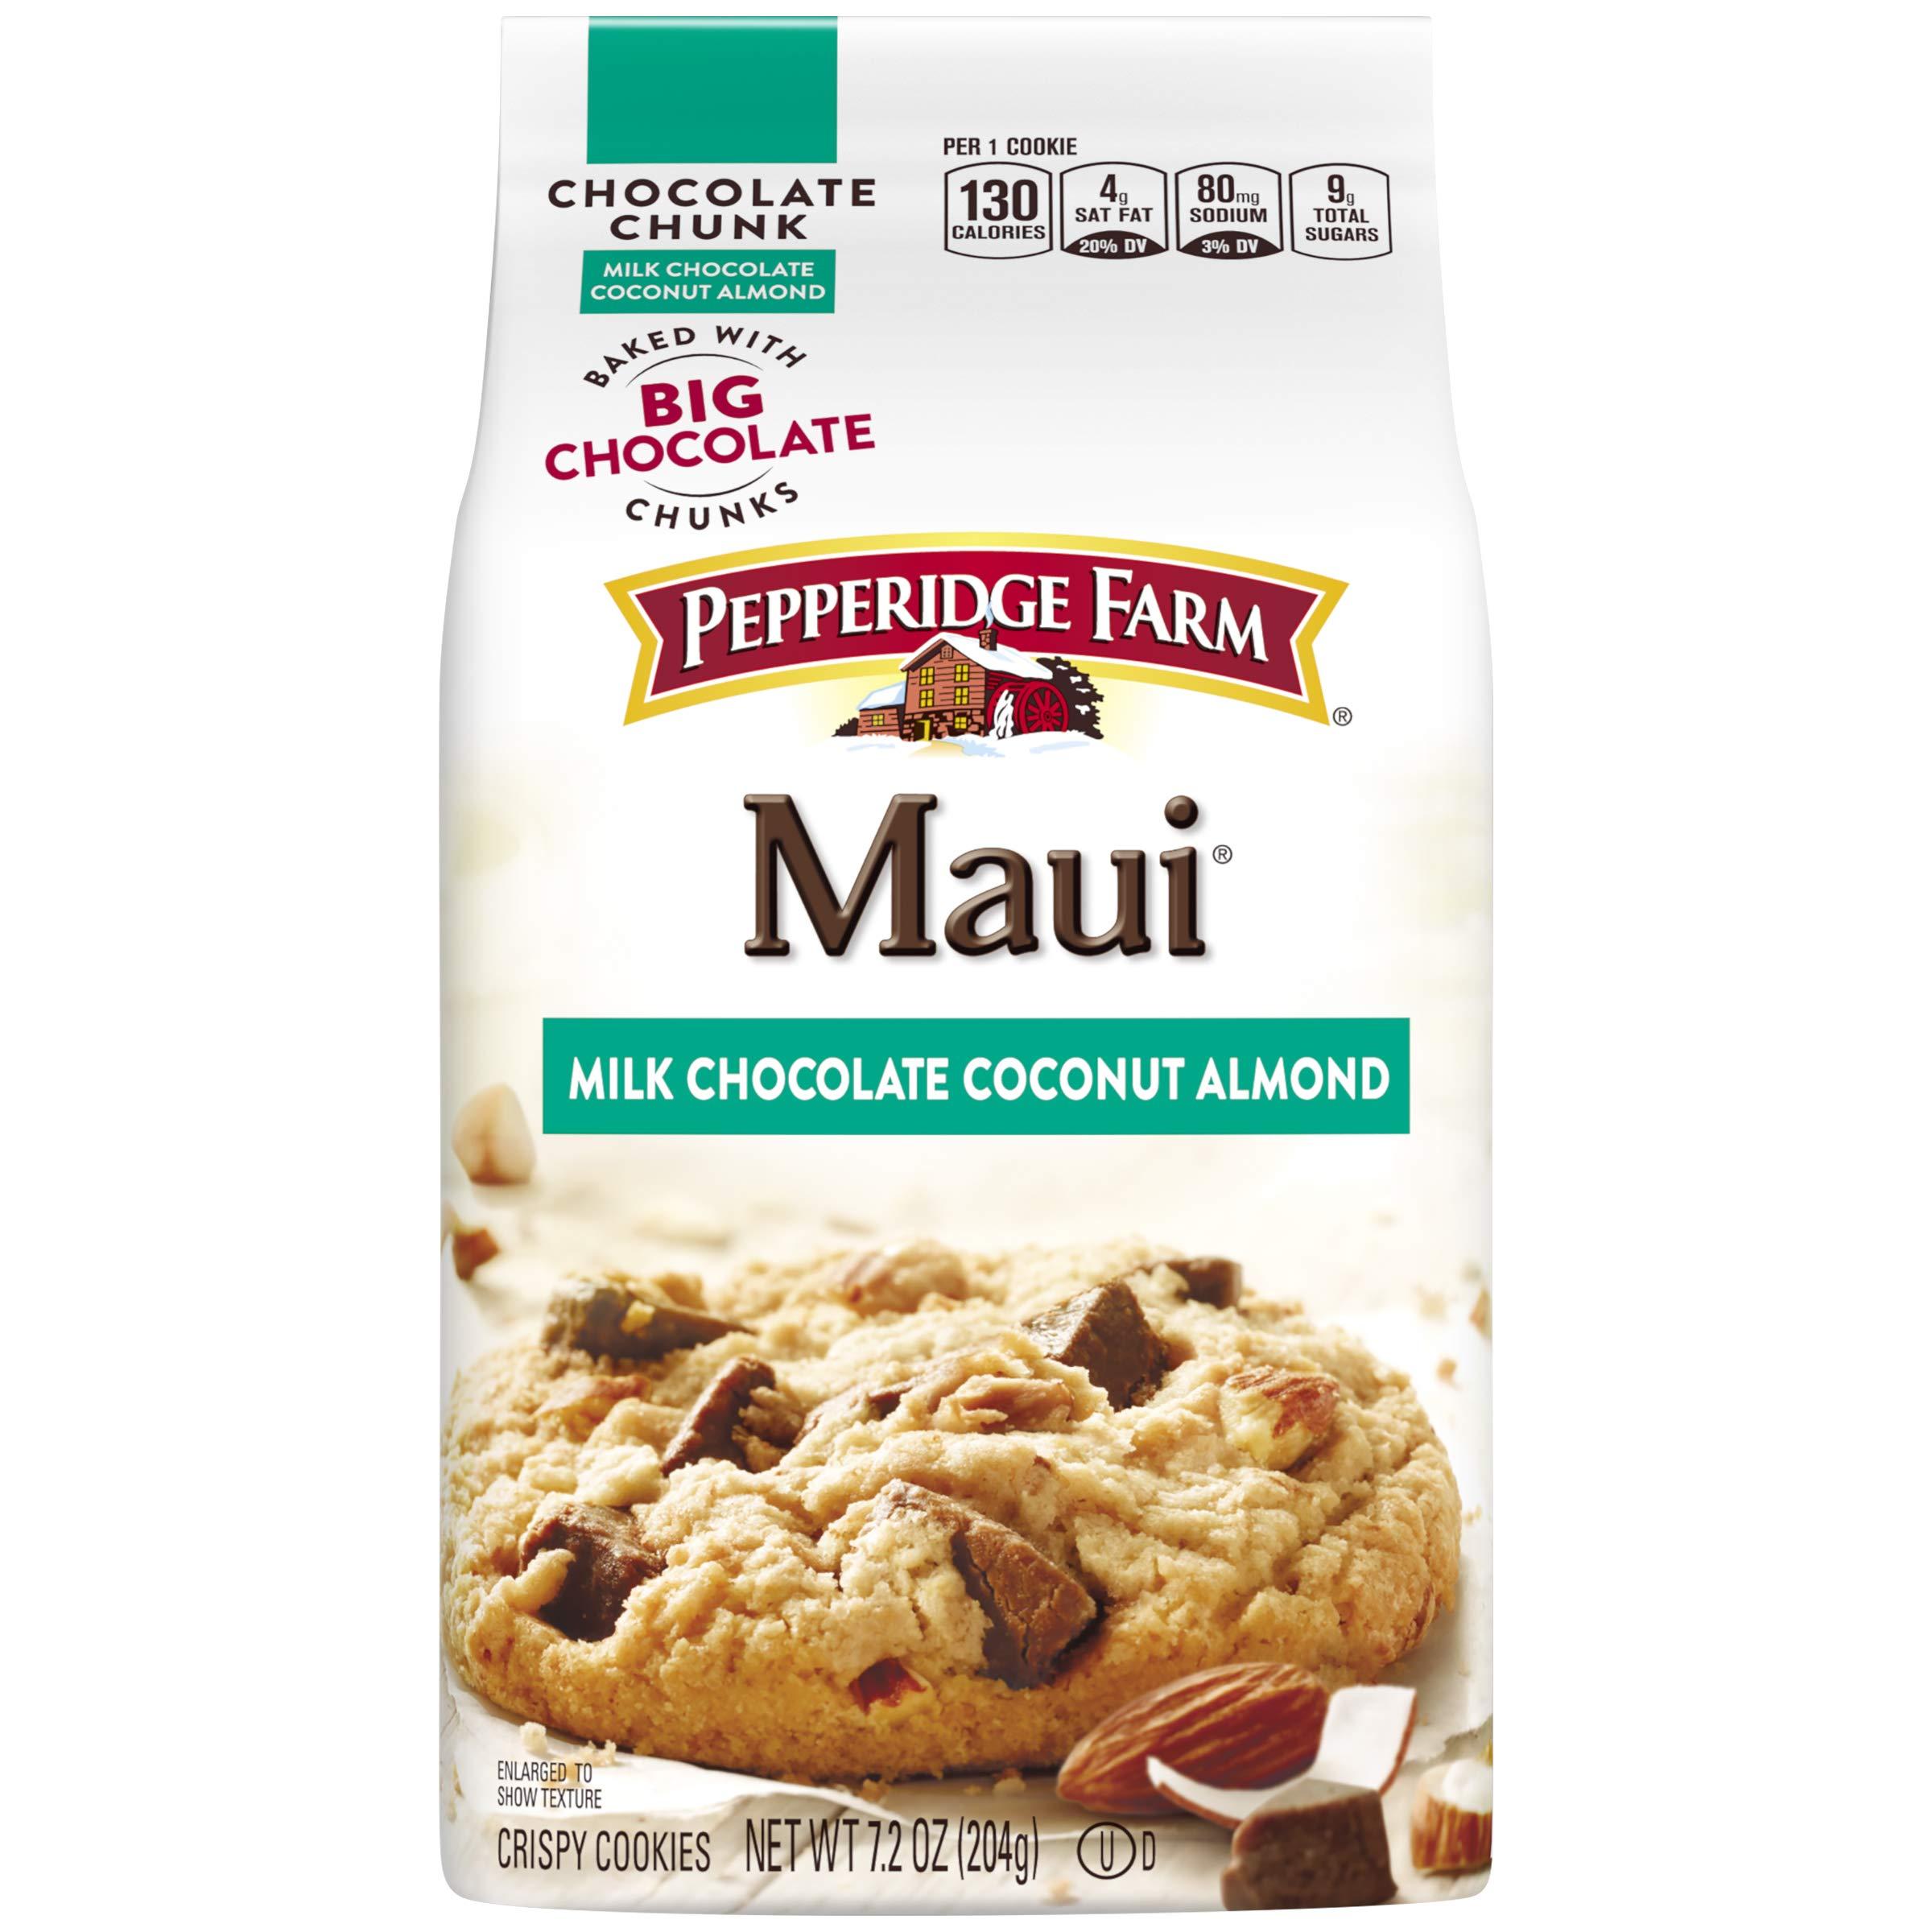 Pepperidge Farm Maui Milk Chocolate Coconut Almond Chocolate Chunk Crispy Cookies (Pack of 4)